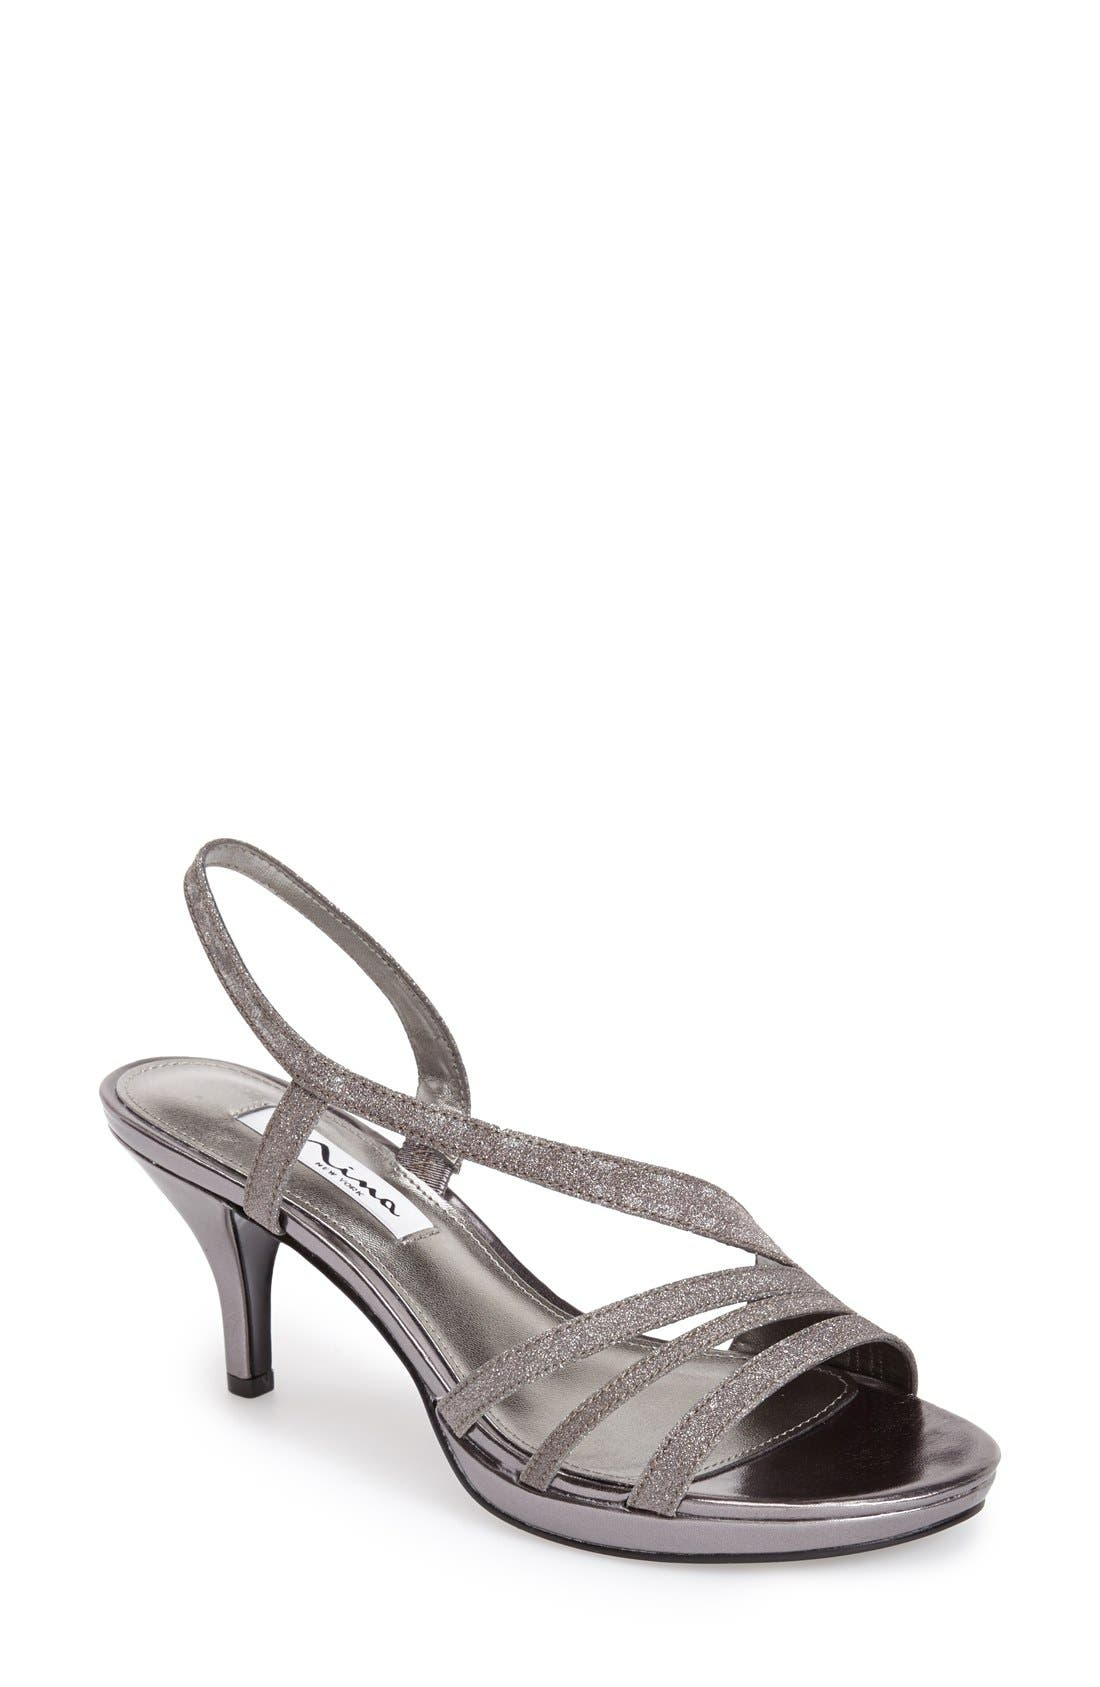 6df92c4cb52 Nina  Neely  Slingback Platform Sandal